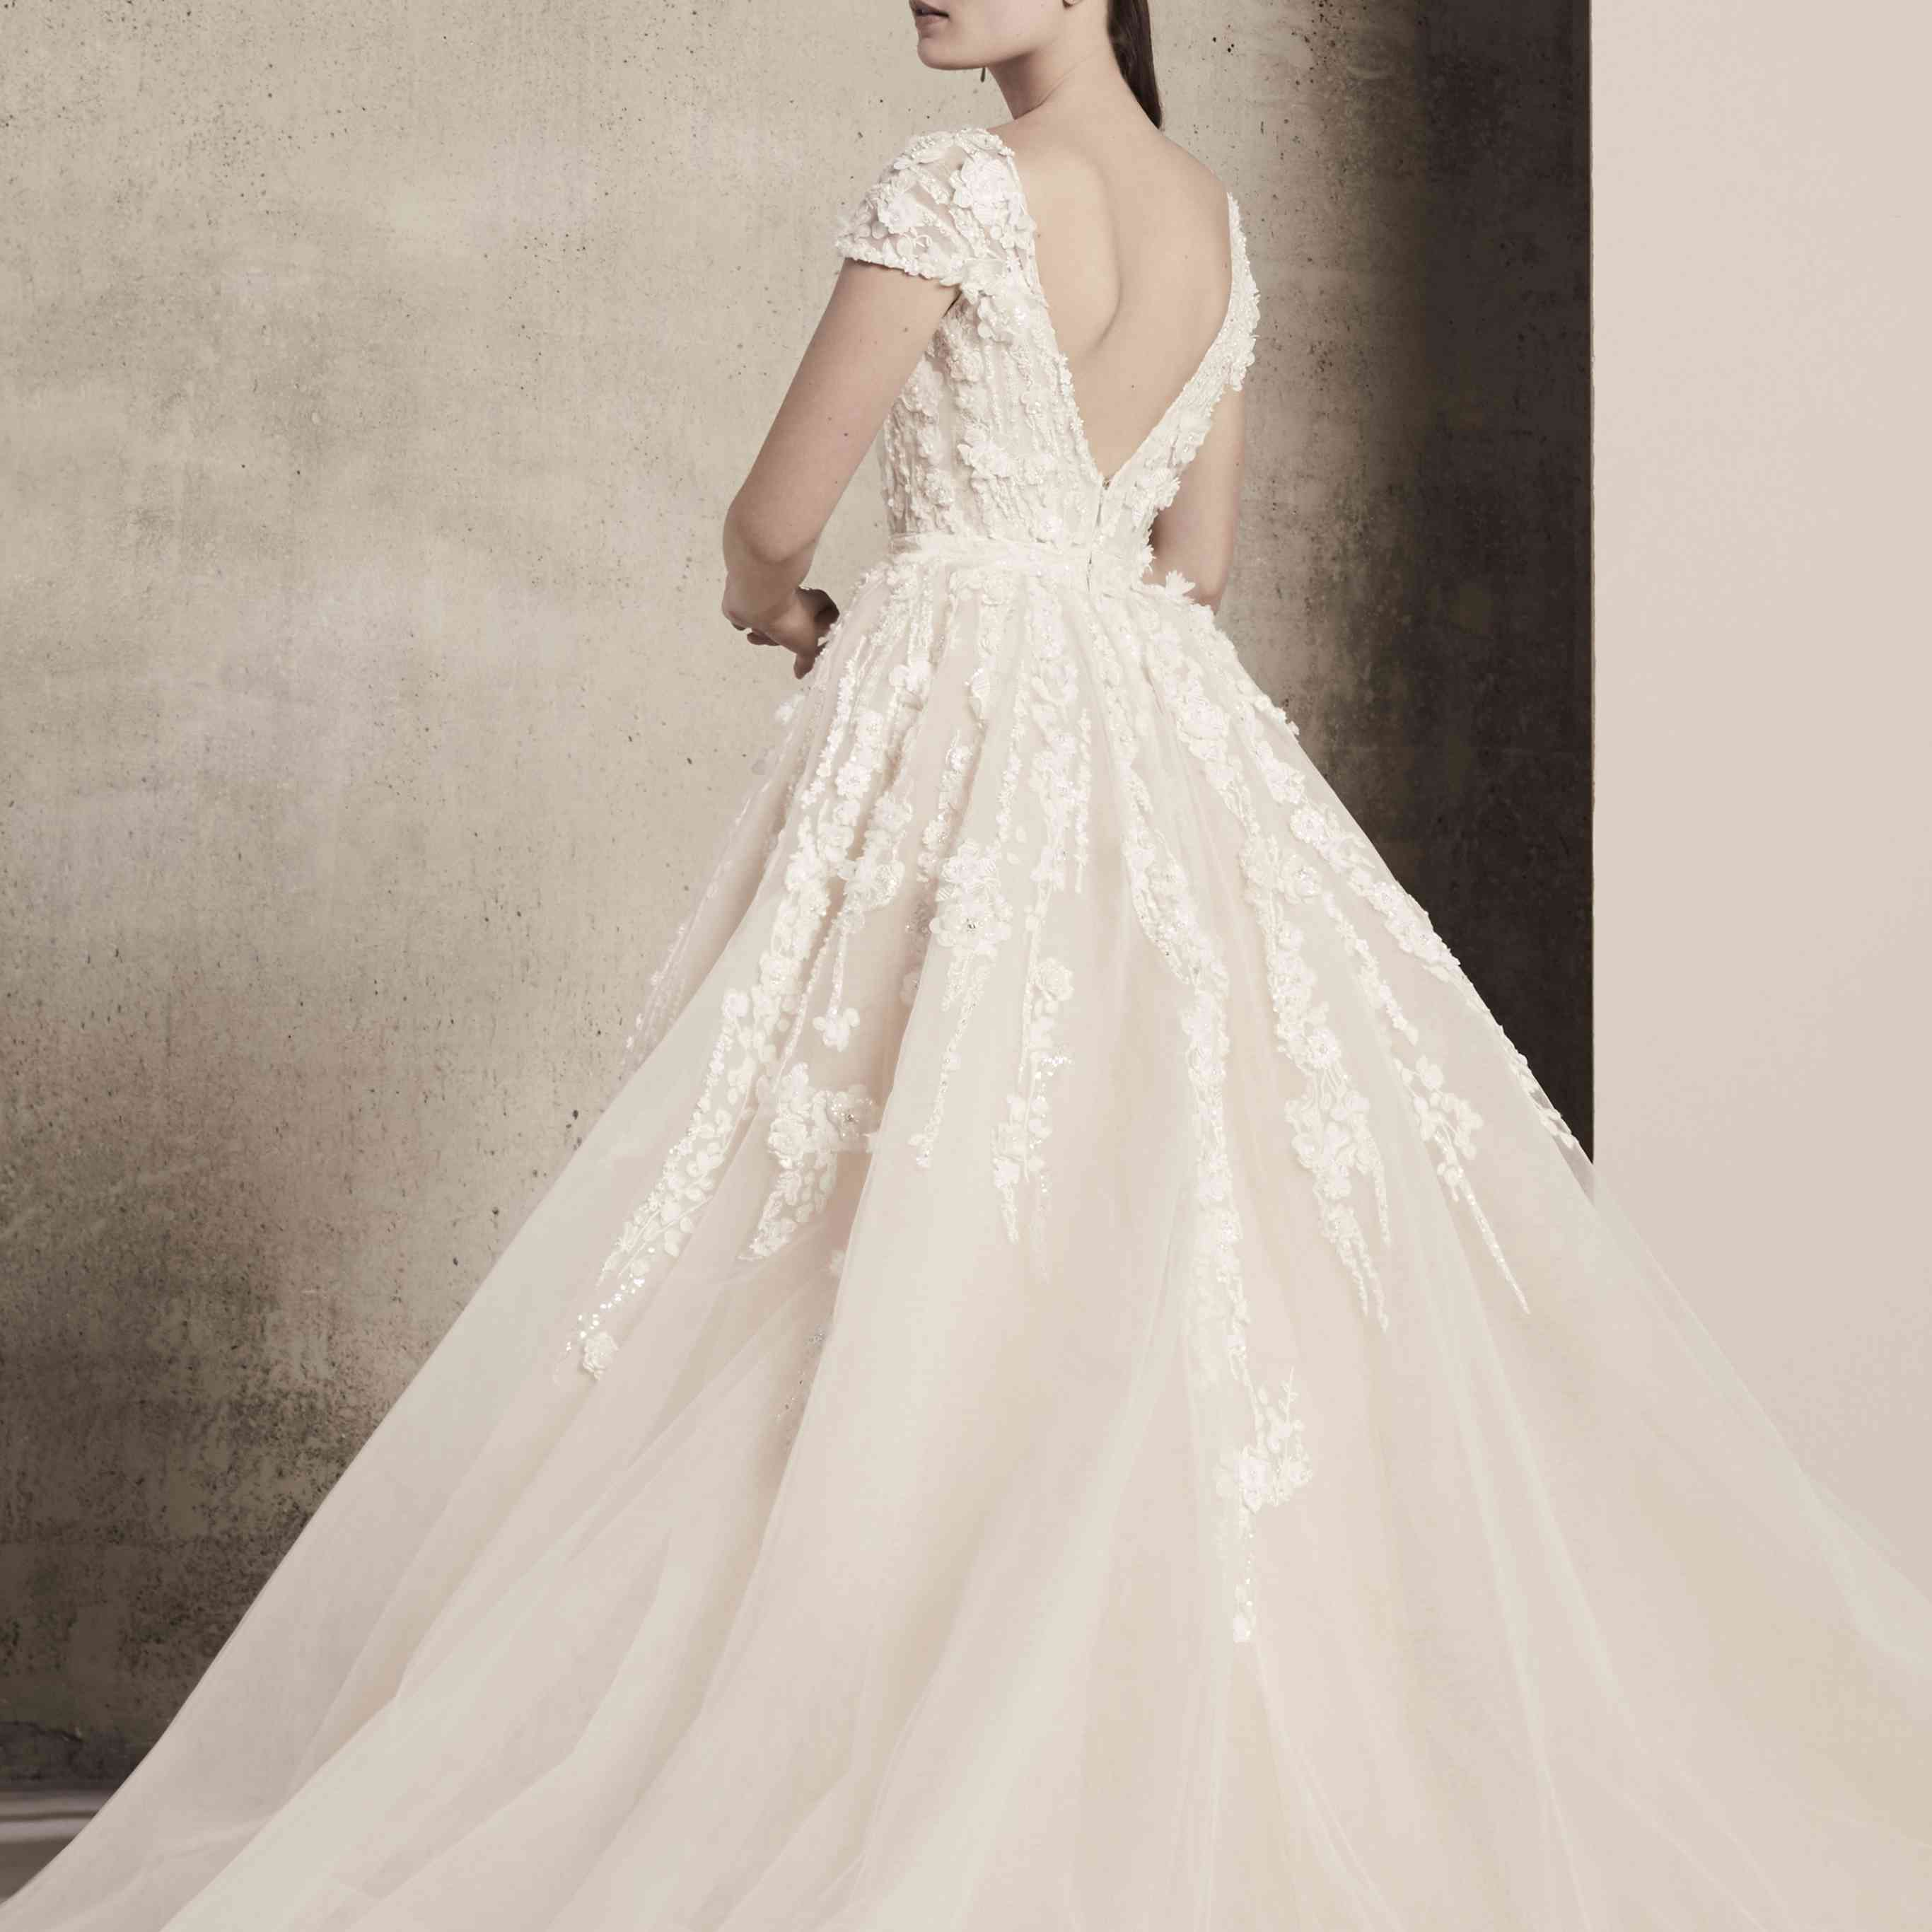 Elie Saab Wedding Dresses.Elie Saab Bridal Spring 2018